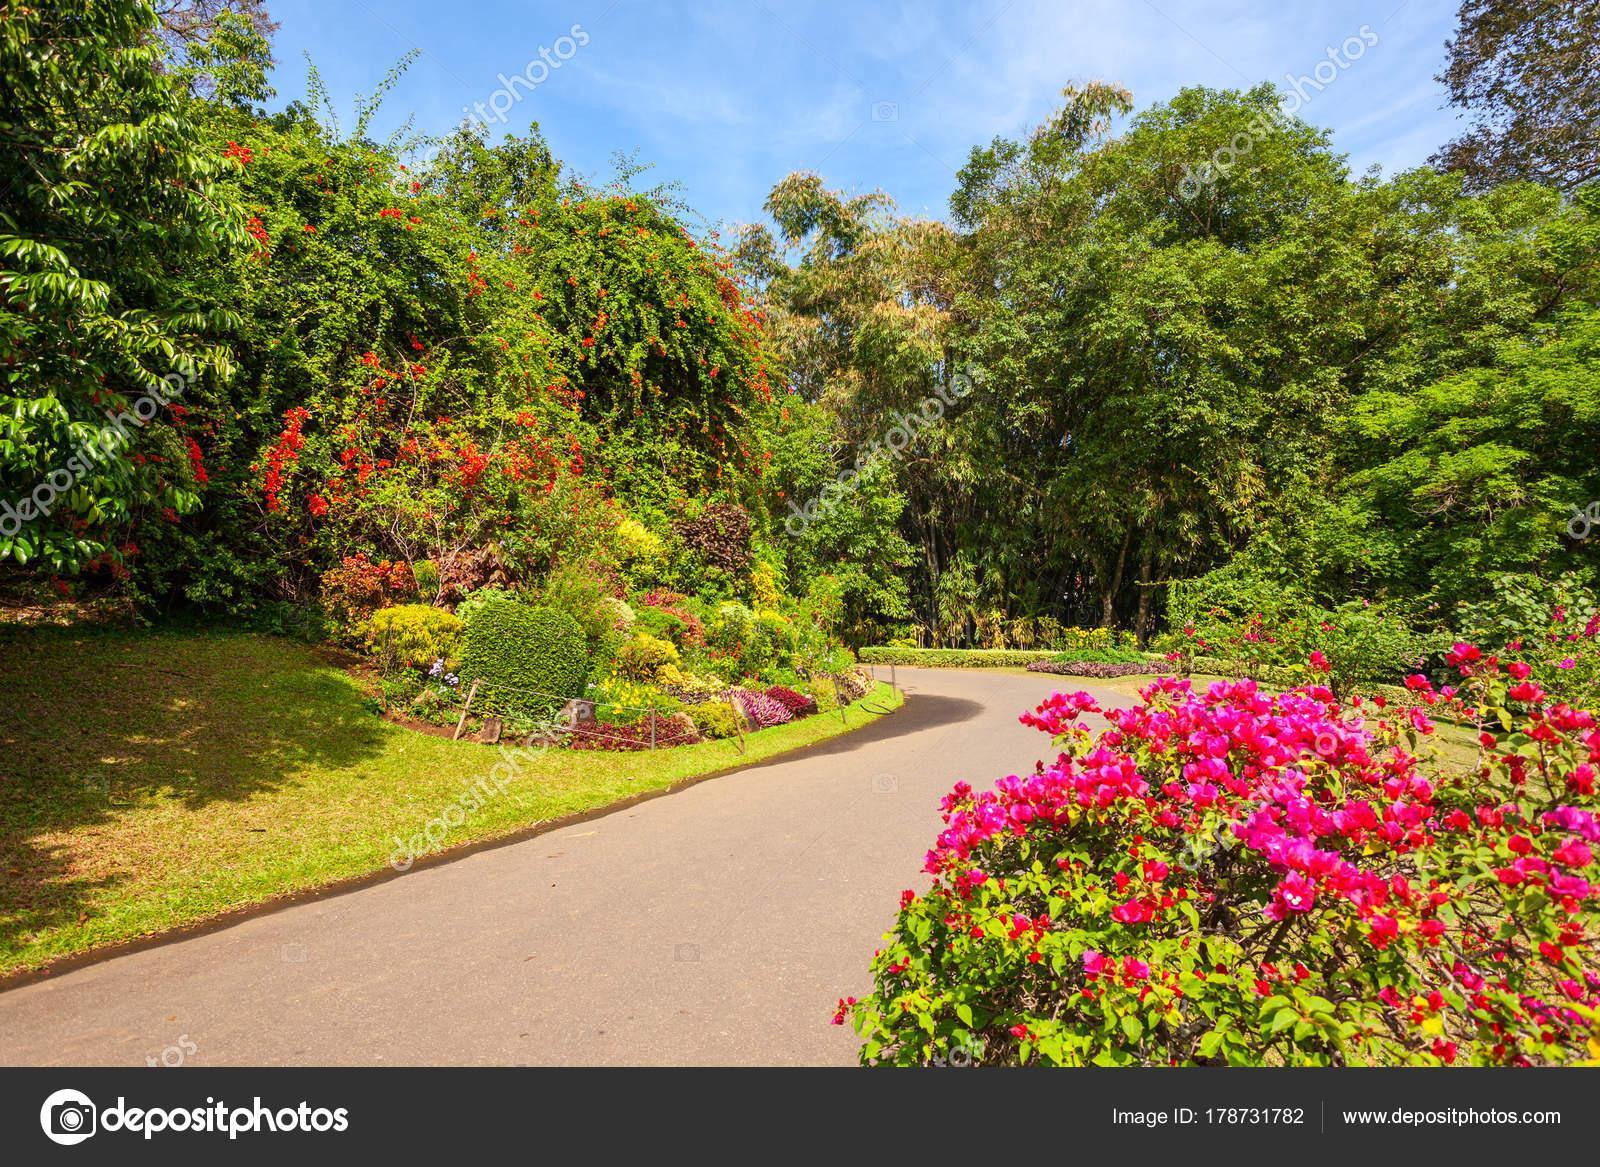 depositphotos stock photo peradeniya royal botanic gardens